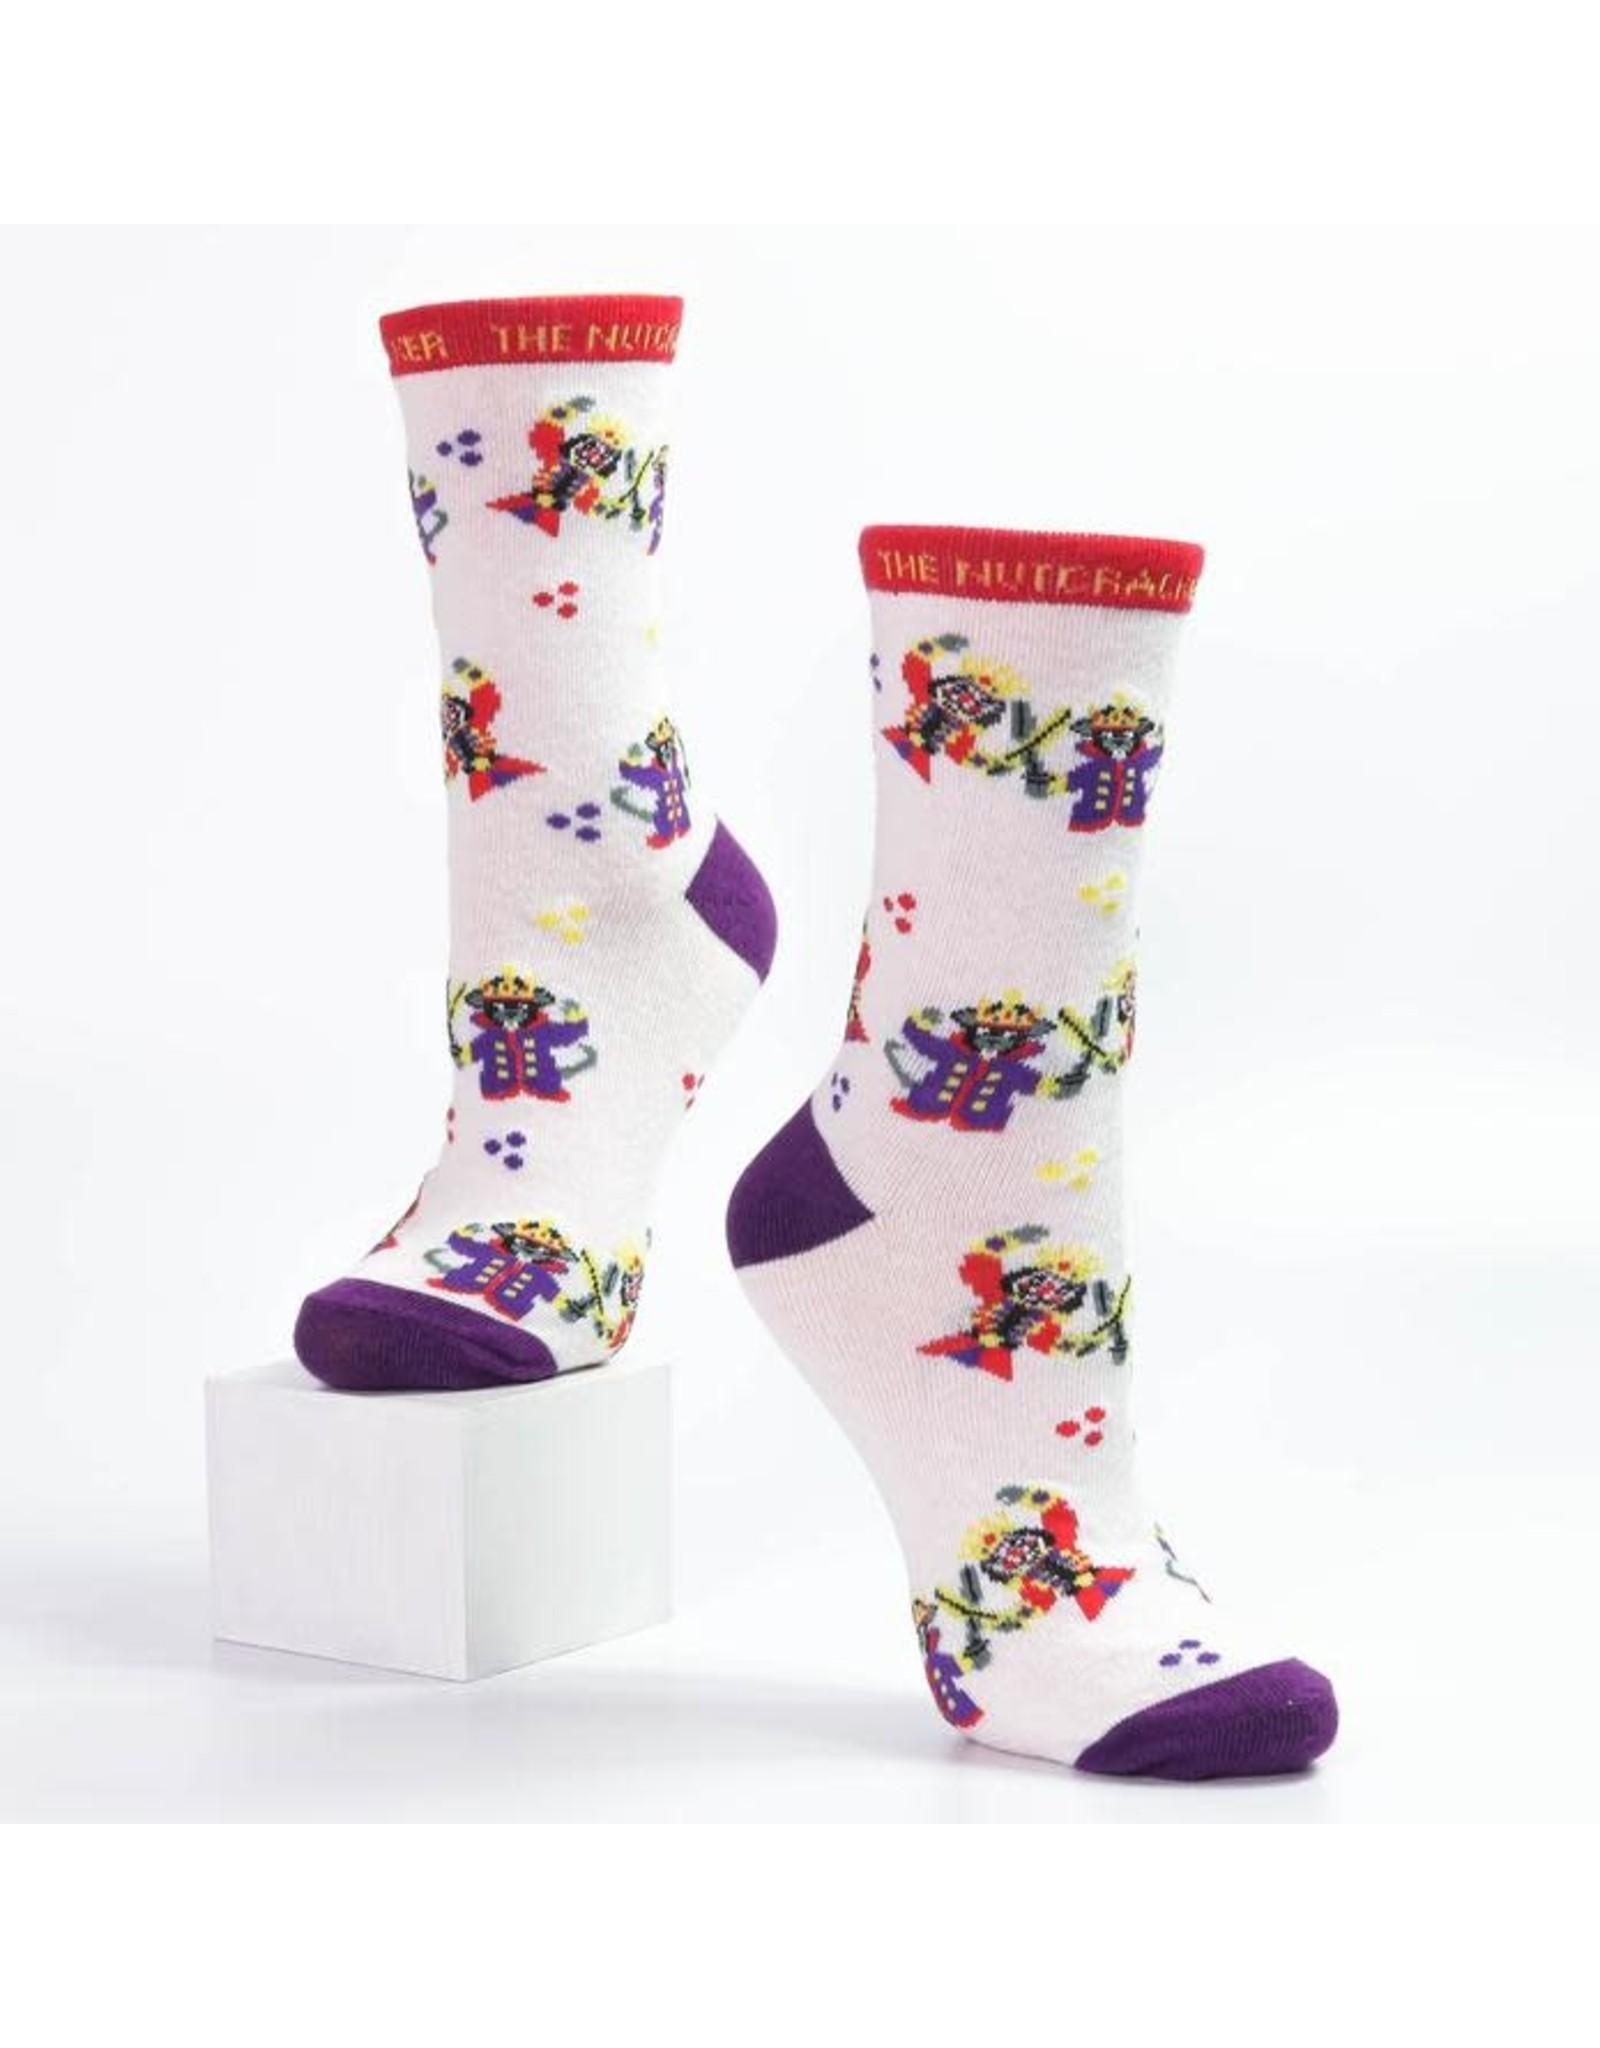 Nutcracker Ballet Gifts Nutcracker battle scene socks